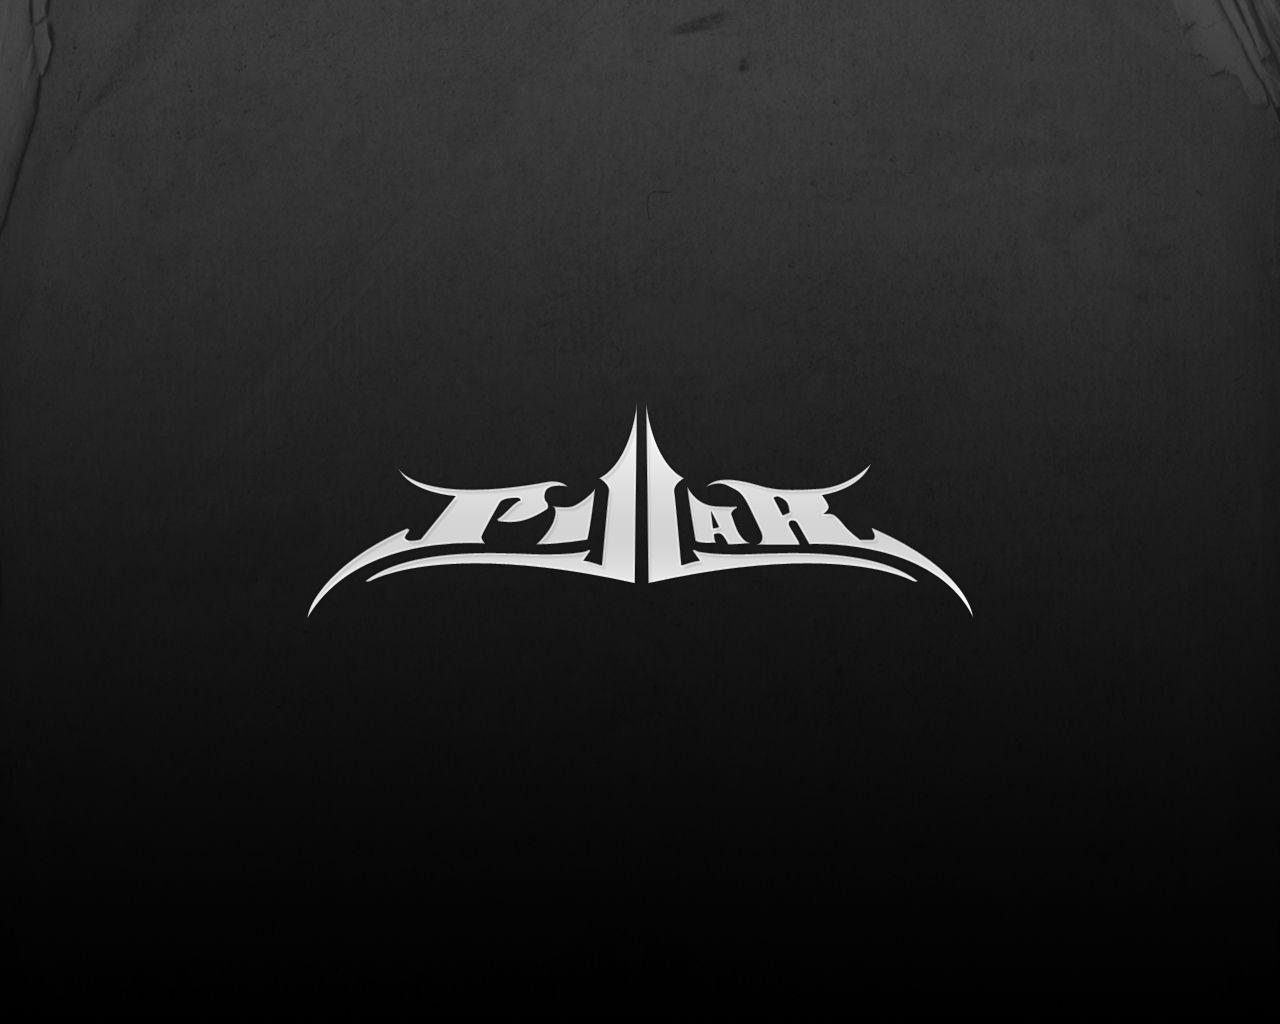 Pillar! Best Song - Frontline | Music/Movies/Video Games/TV